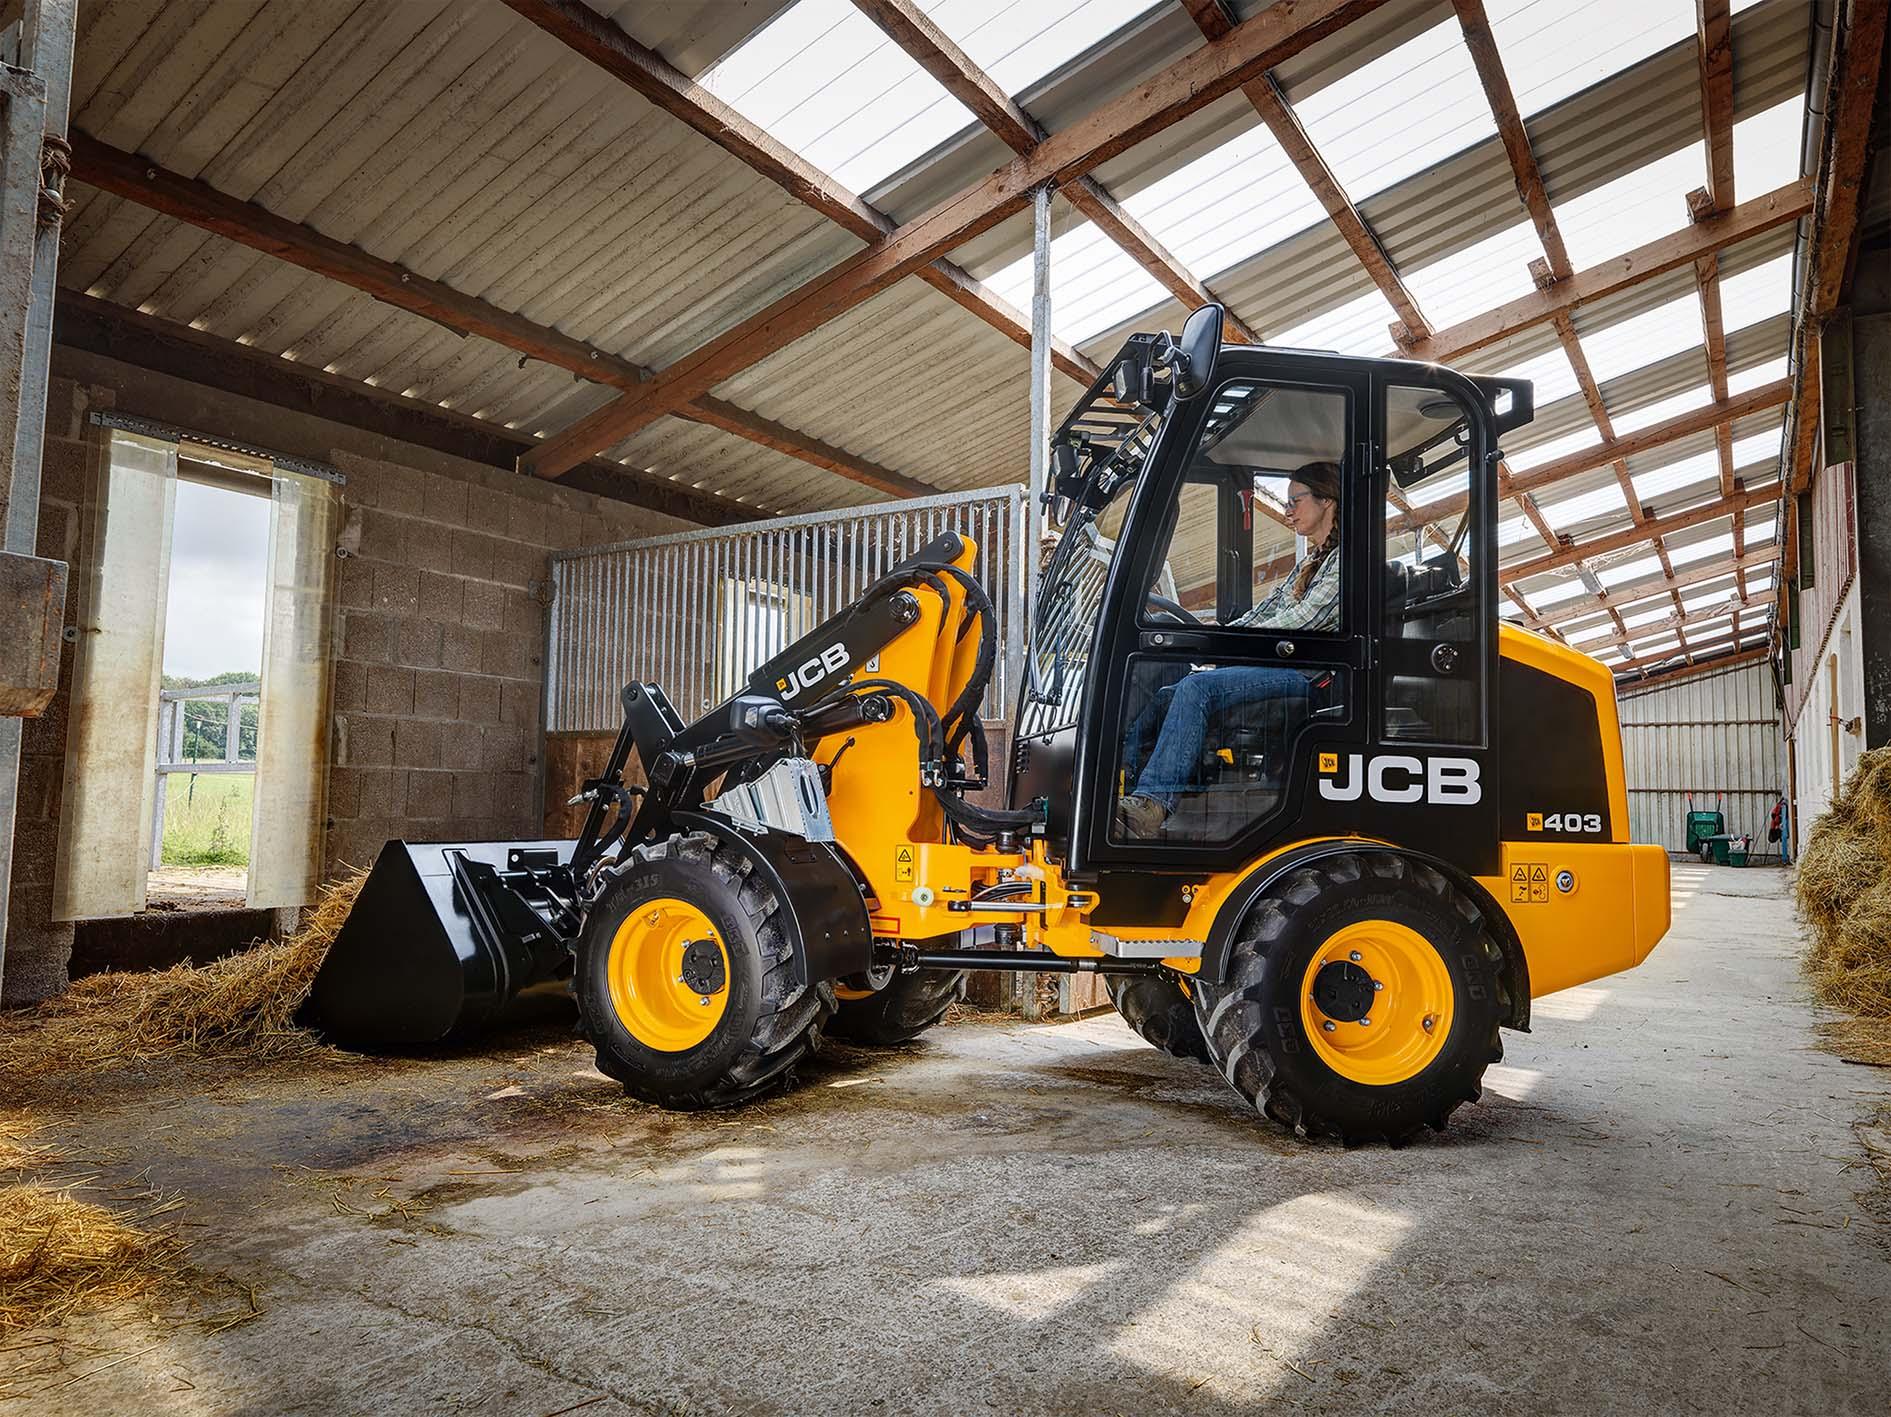 jcb macchine industriali - Pagina 2 A_WLS_403_28